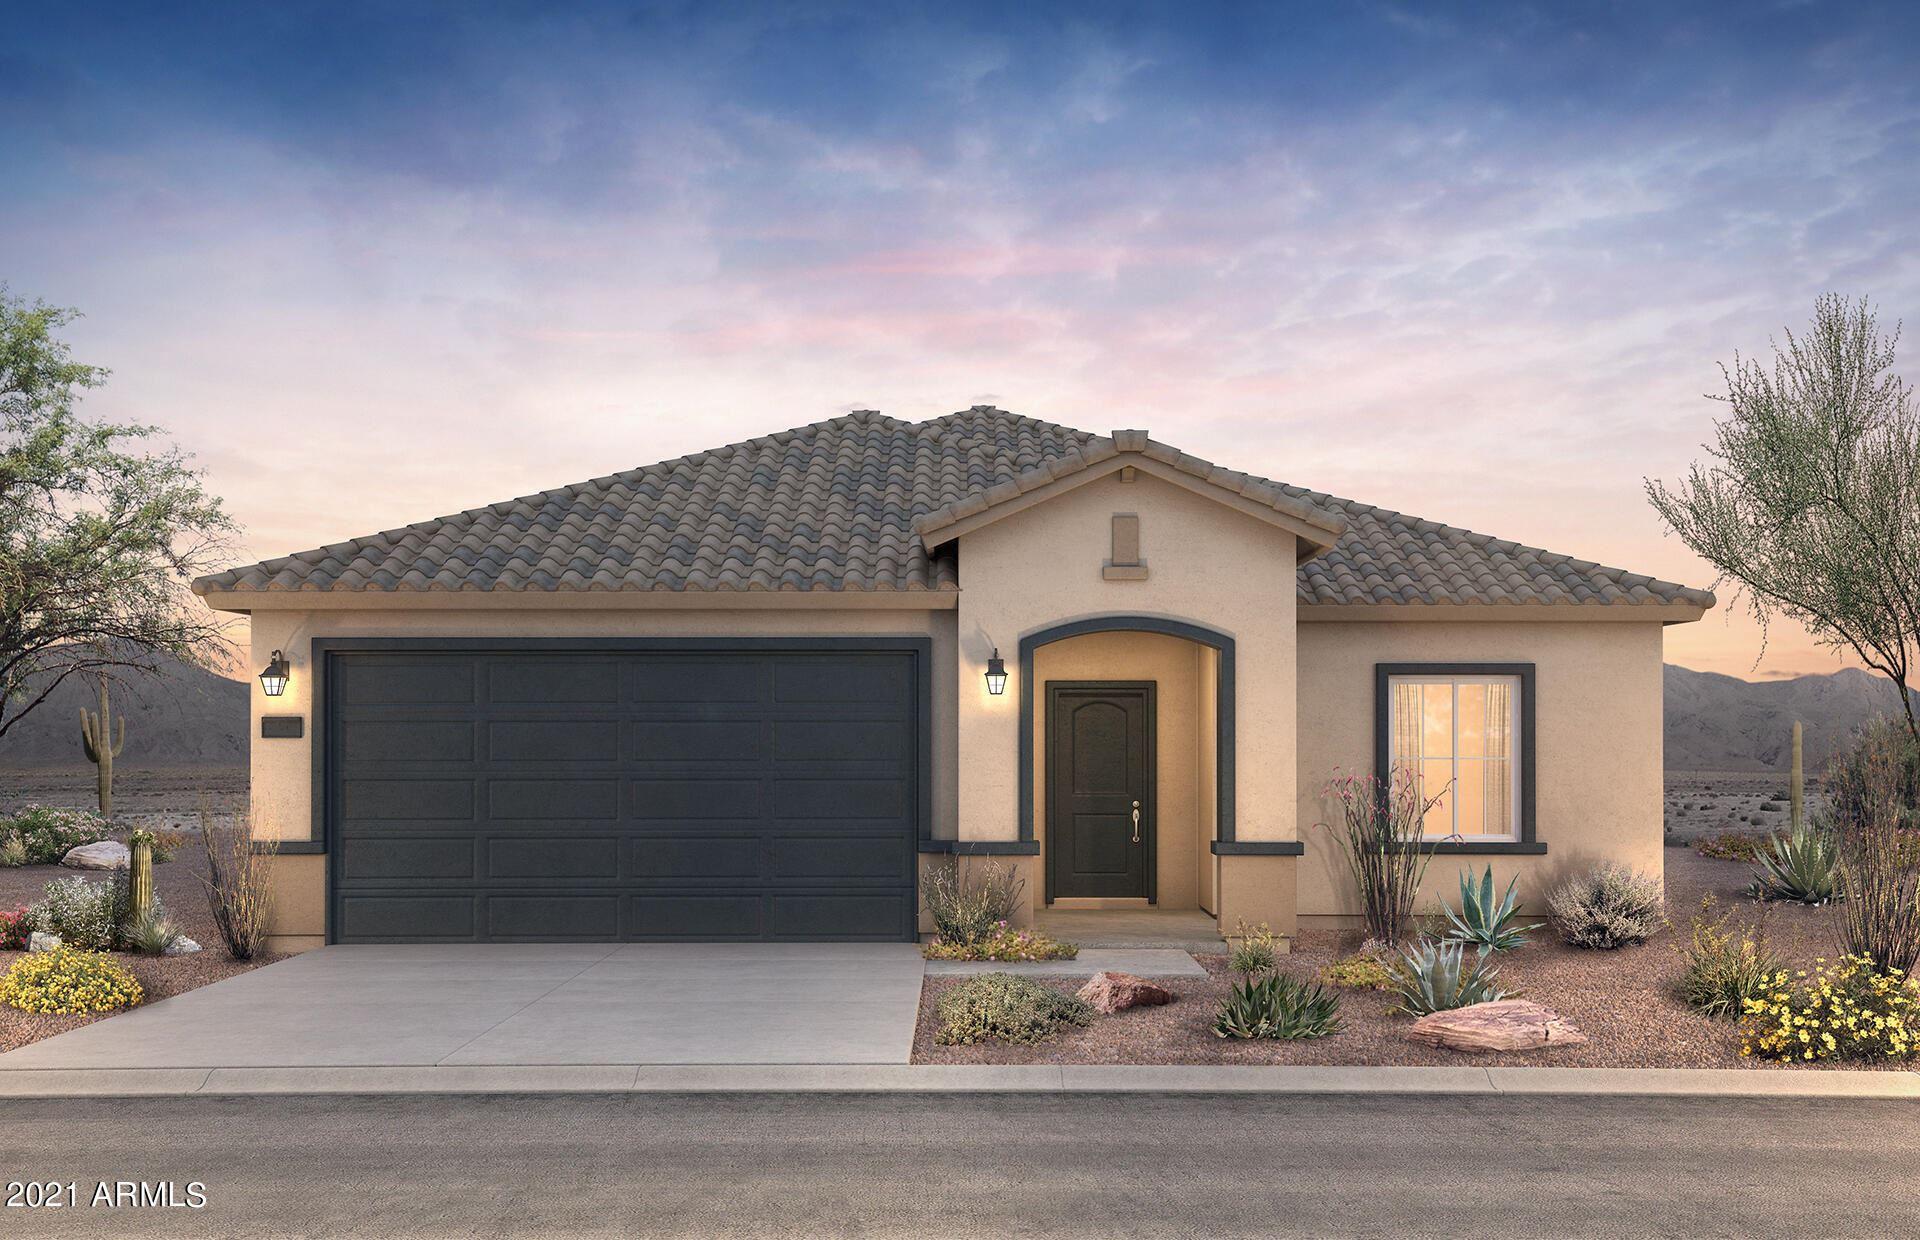 Photo for 43759 W MESCAL Street, Maricopa, AZ 85138 (MLS # 6283234)